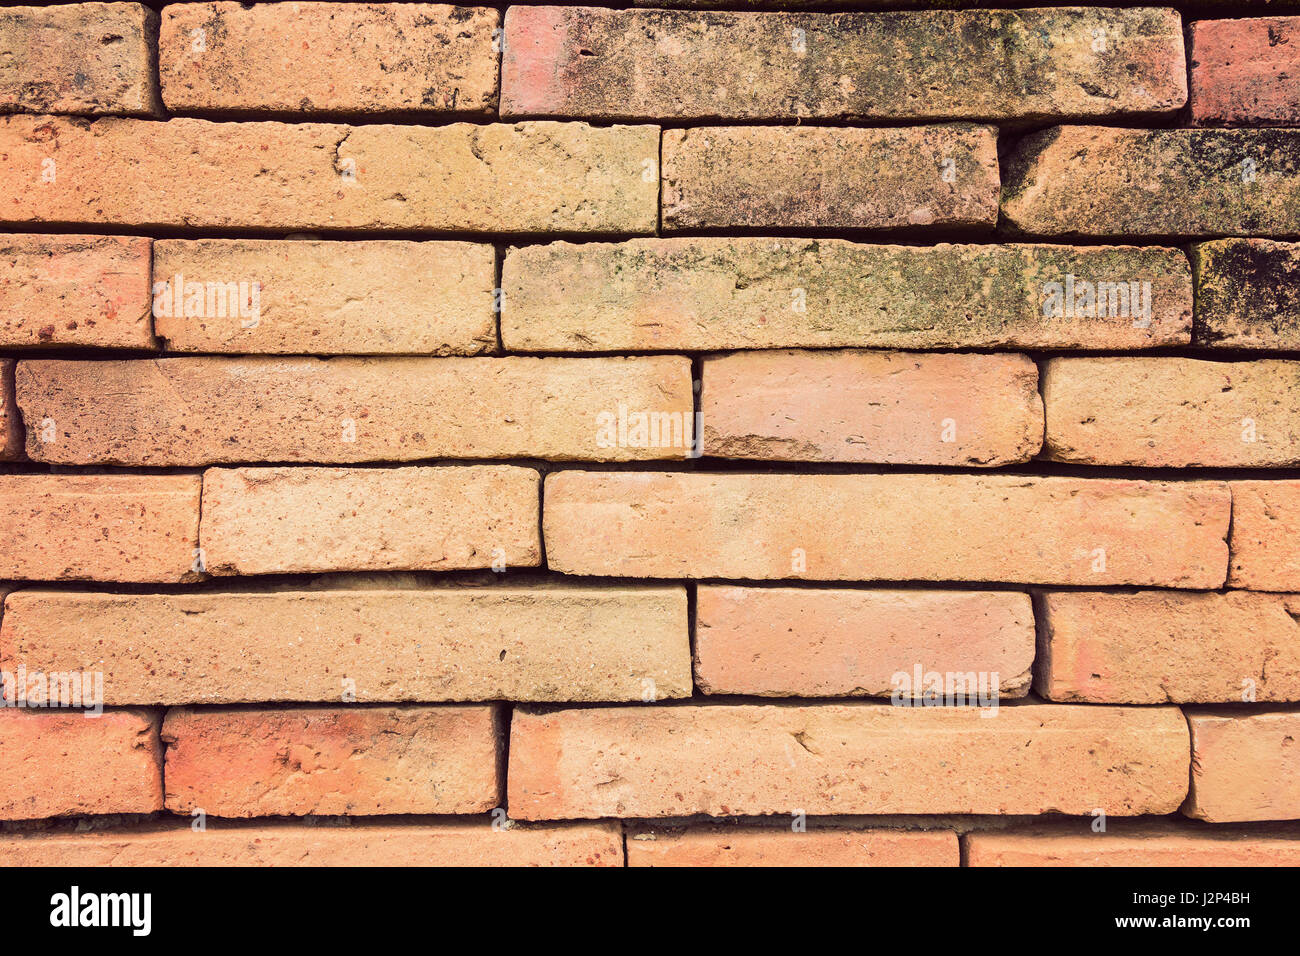 Terracotta Brick Stock Photos & Terracotta Brick Stock Images - Alamy